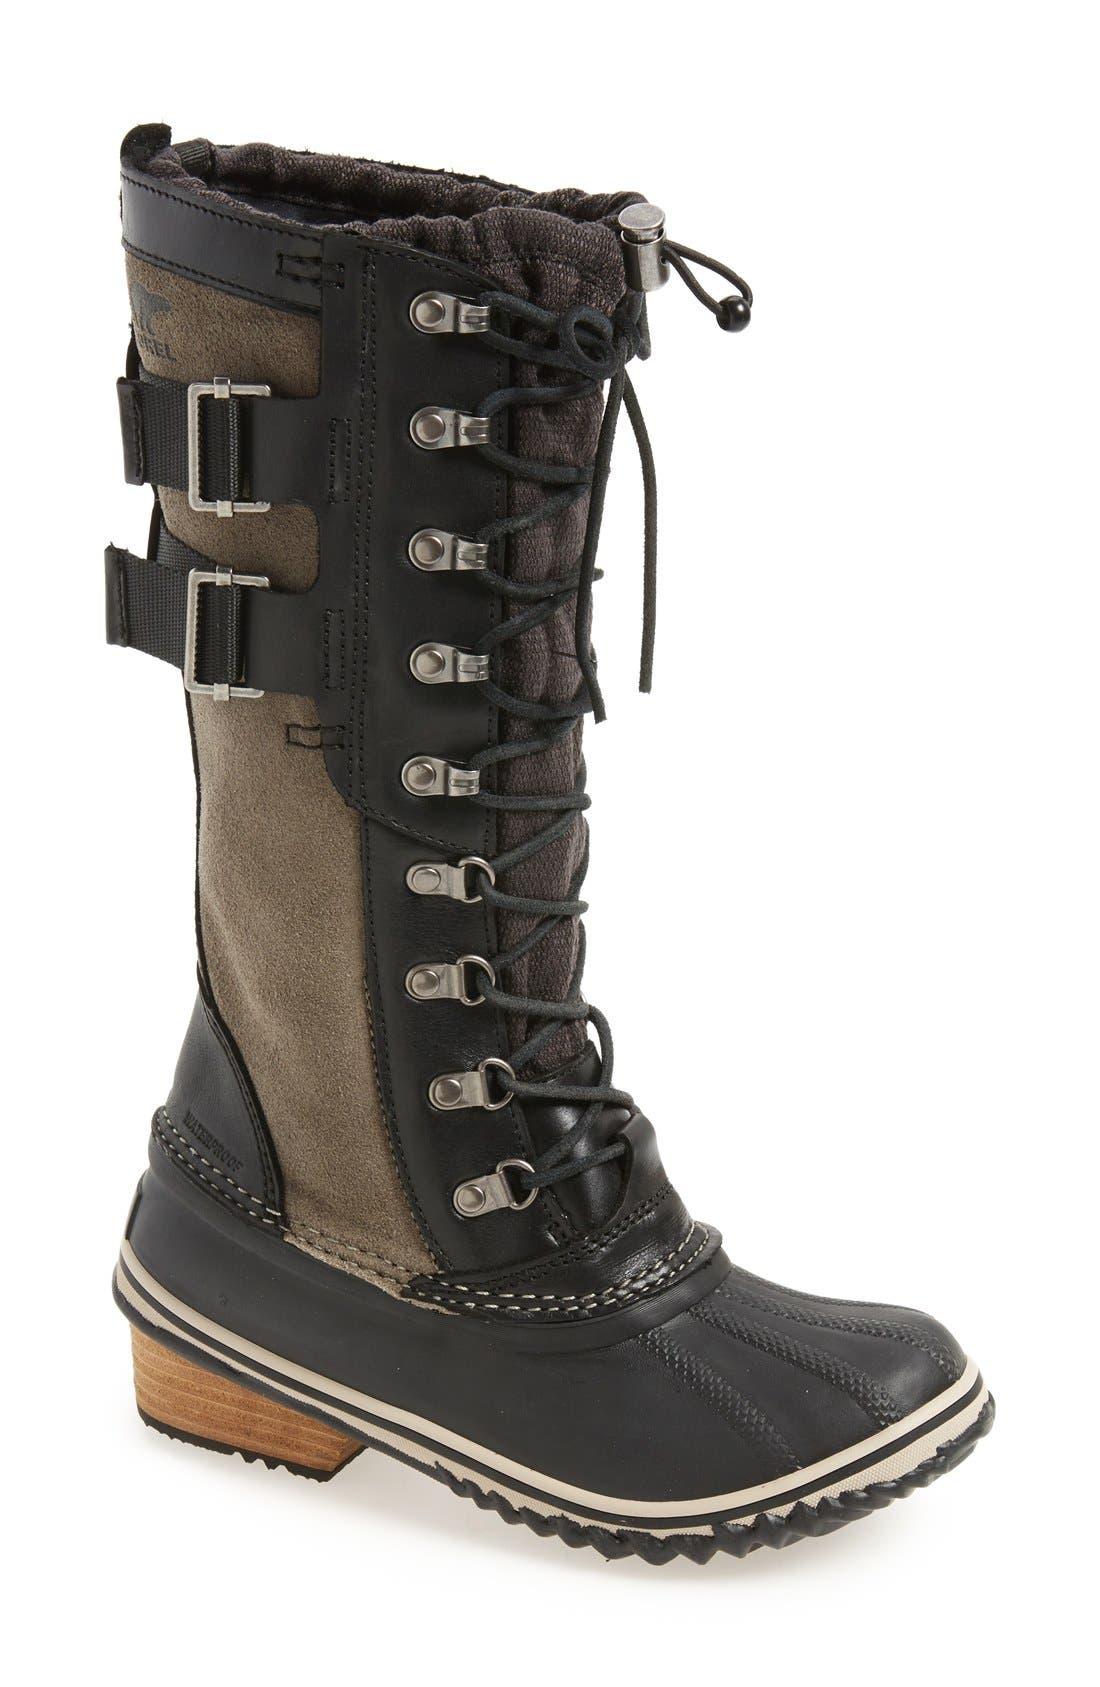 Main Image - SOREL 'Conquest Carly II' Waterproof Mid Calf Boot (Women)